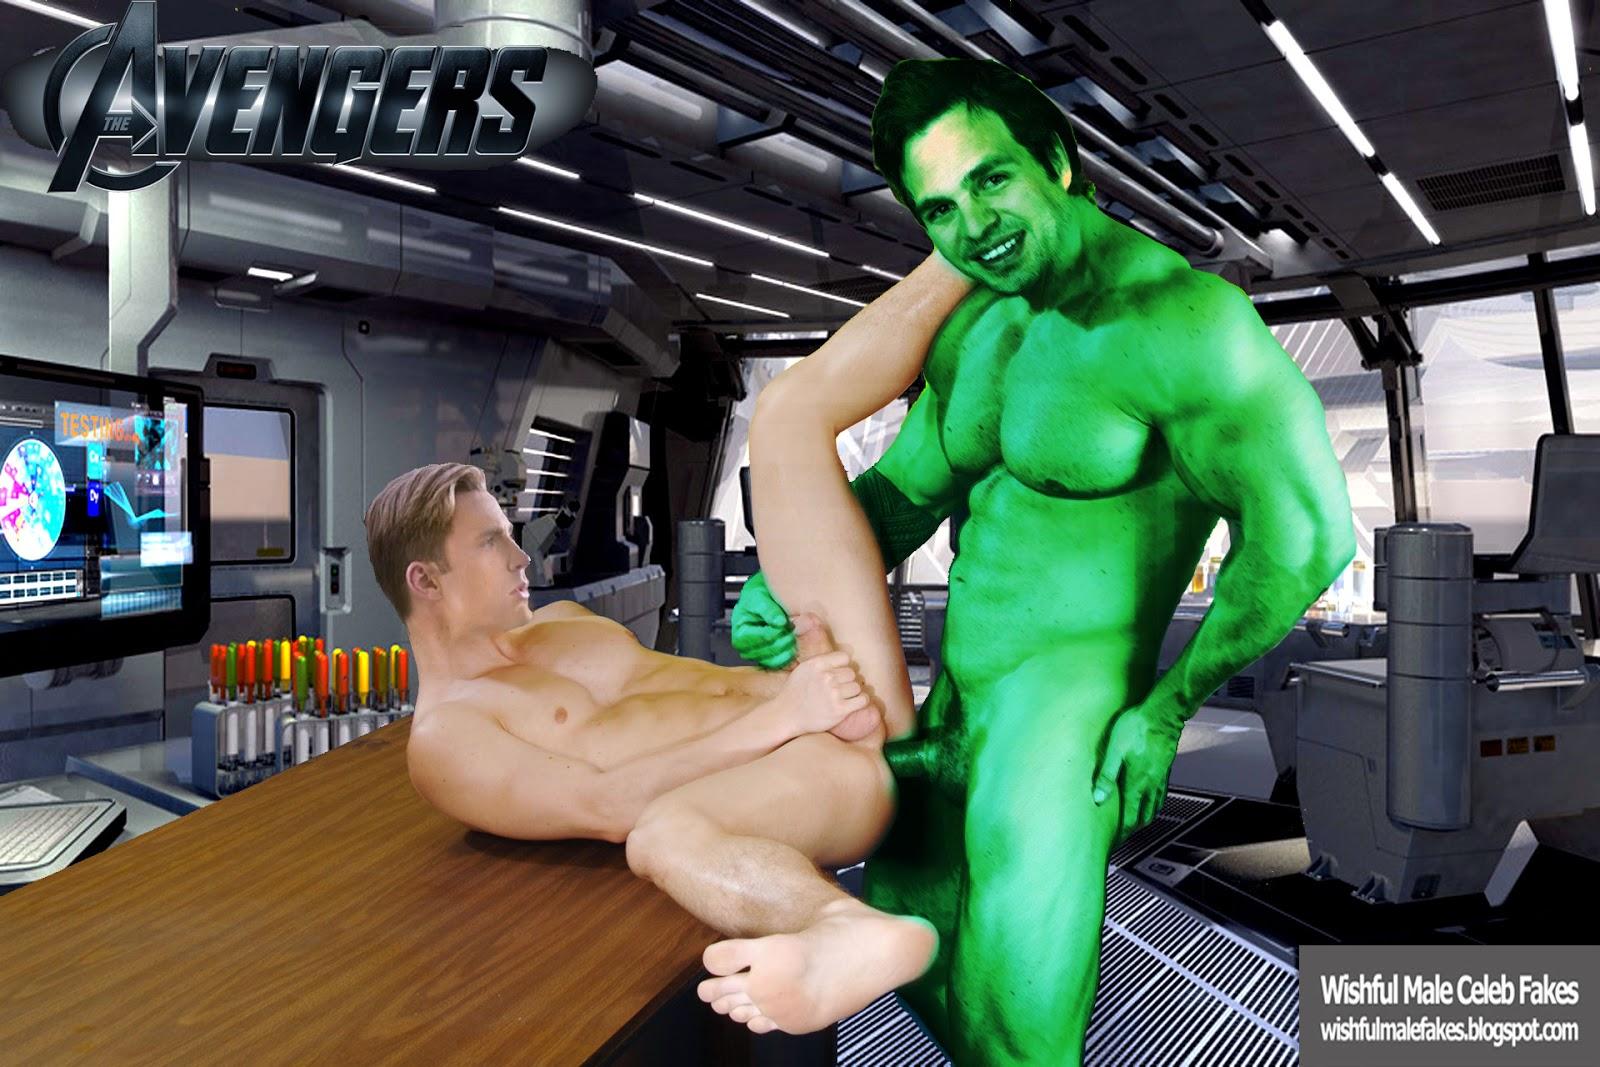 Побежал Юрий порно с капитаном америка быстро съел